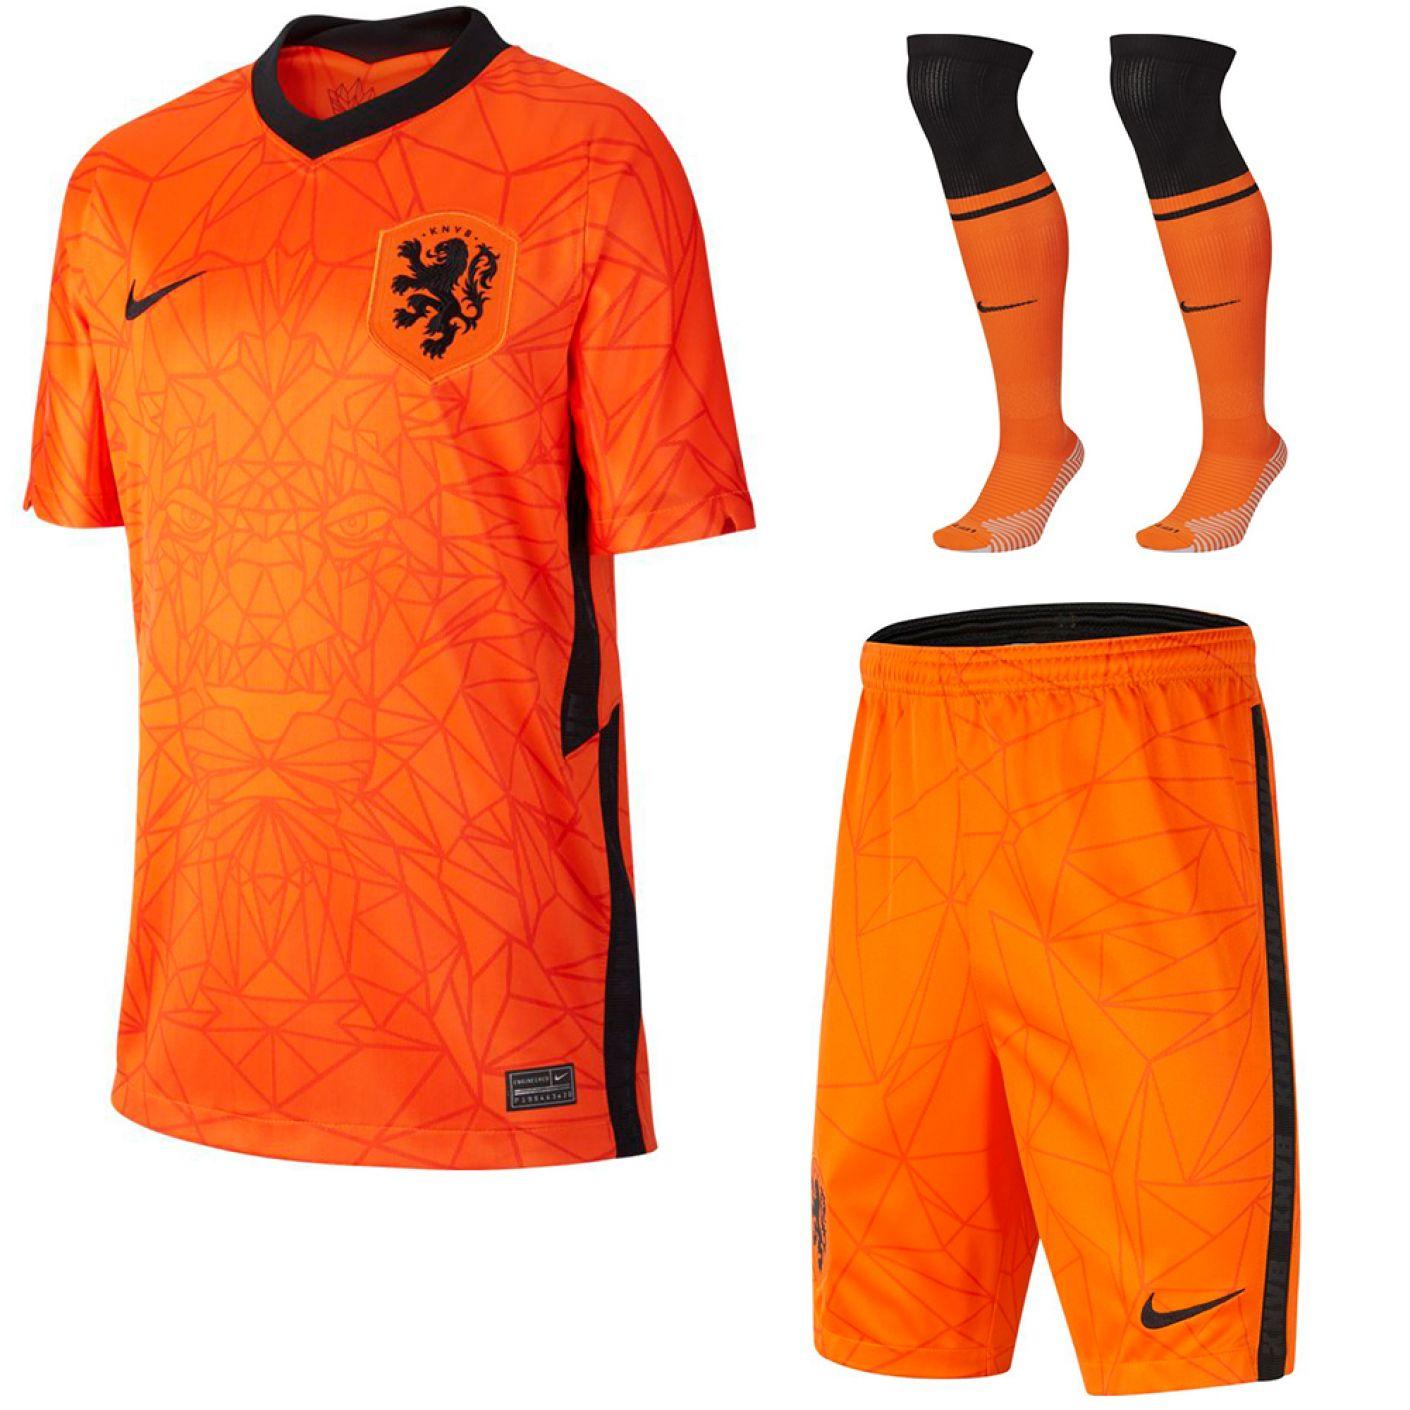 Nike Nederland Thuis Tenue 2020-2022 Kids